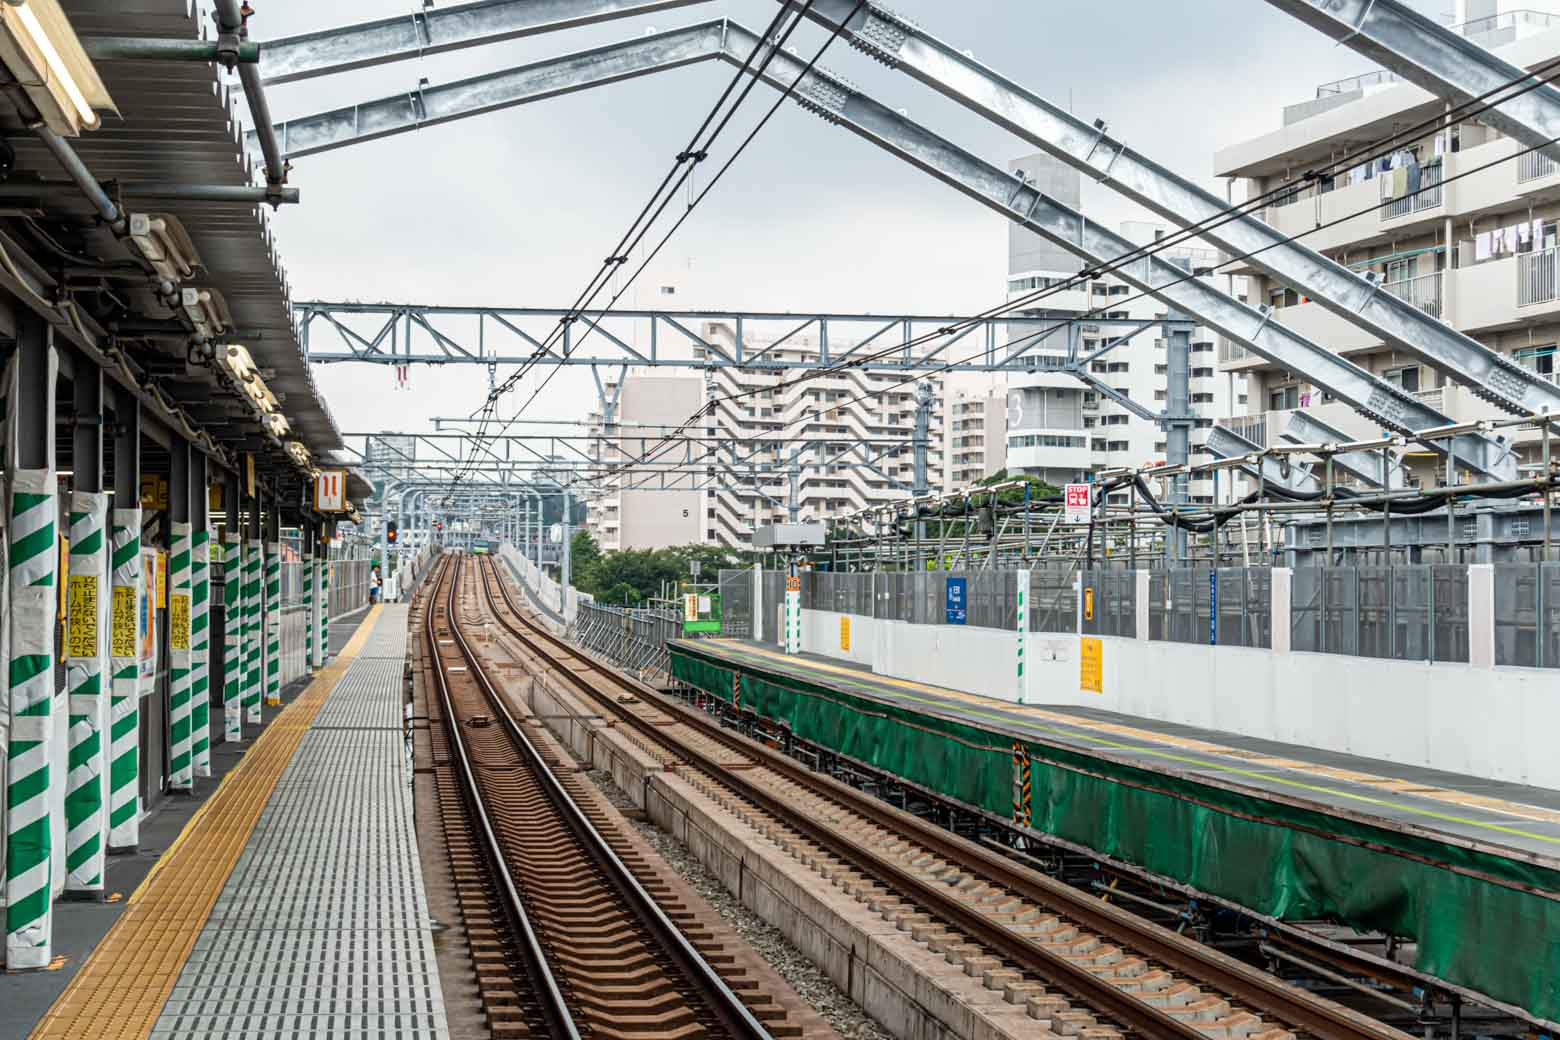 JR直通線計画で盛り上がっている相鉄線。都心への移動が便利になるということで沿線の駅が注目されていますが、駅員さんによると、もともと横浜に近い天王町駅はあまり変化はないとのこと。